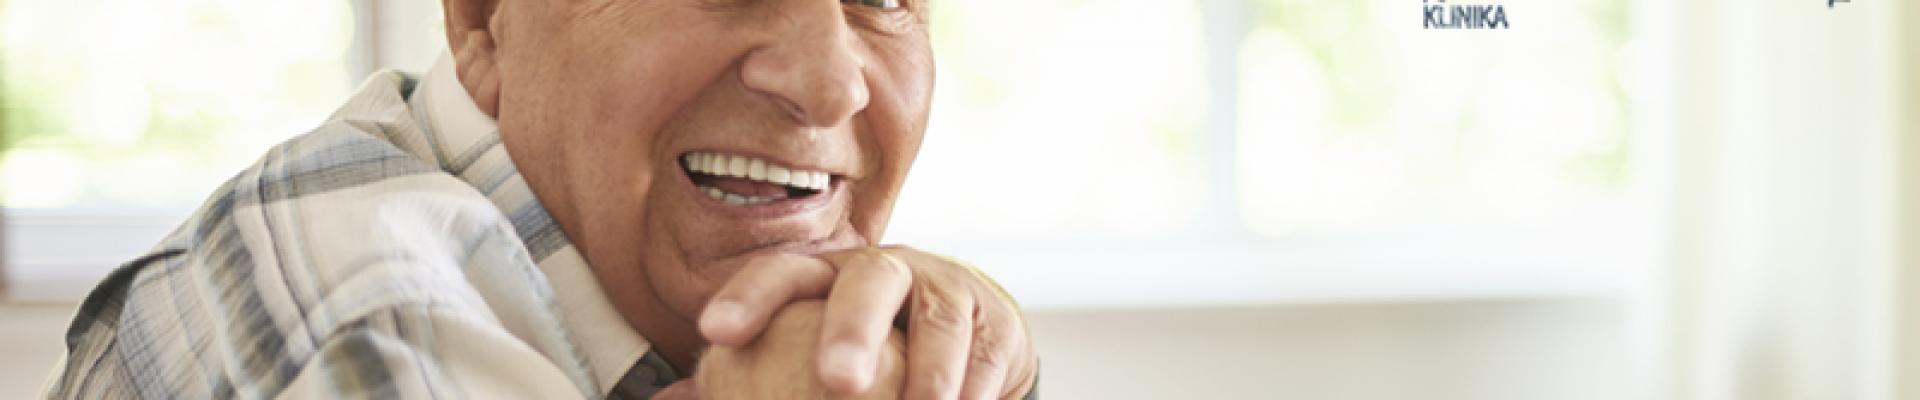 Sintron-y-Dentista-Achútegui-dental-donostia-san-sebastian-Blog